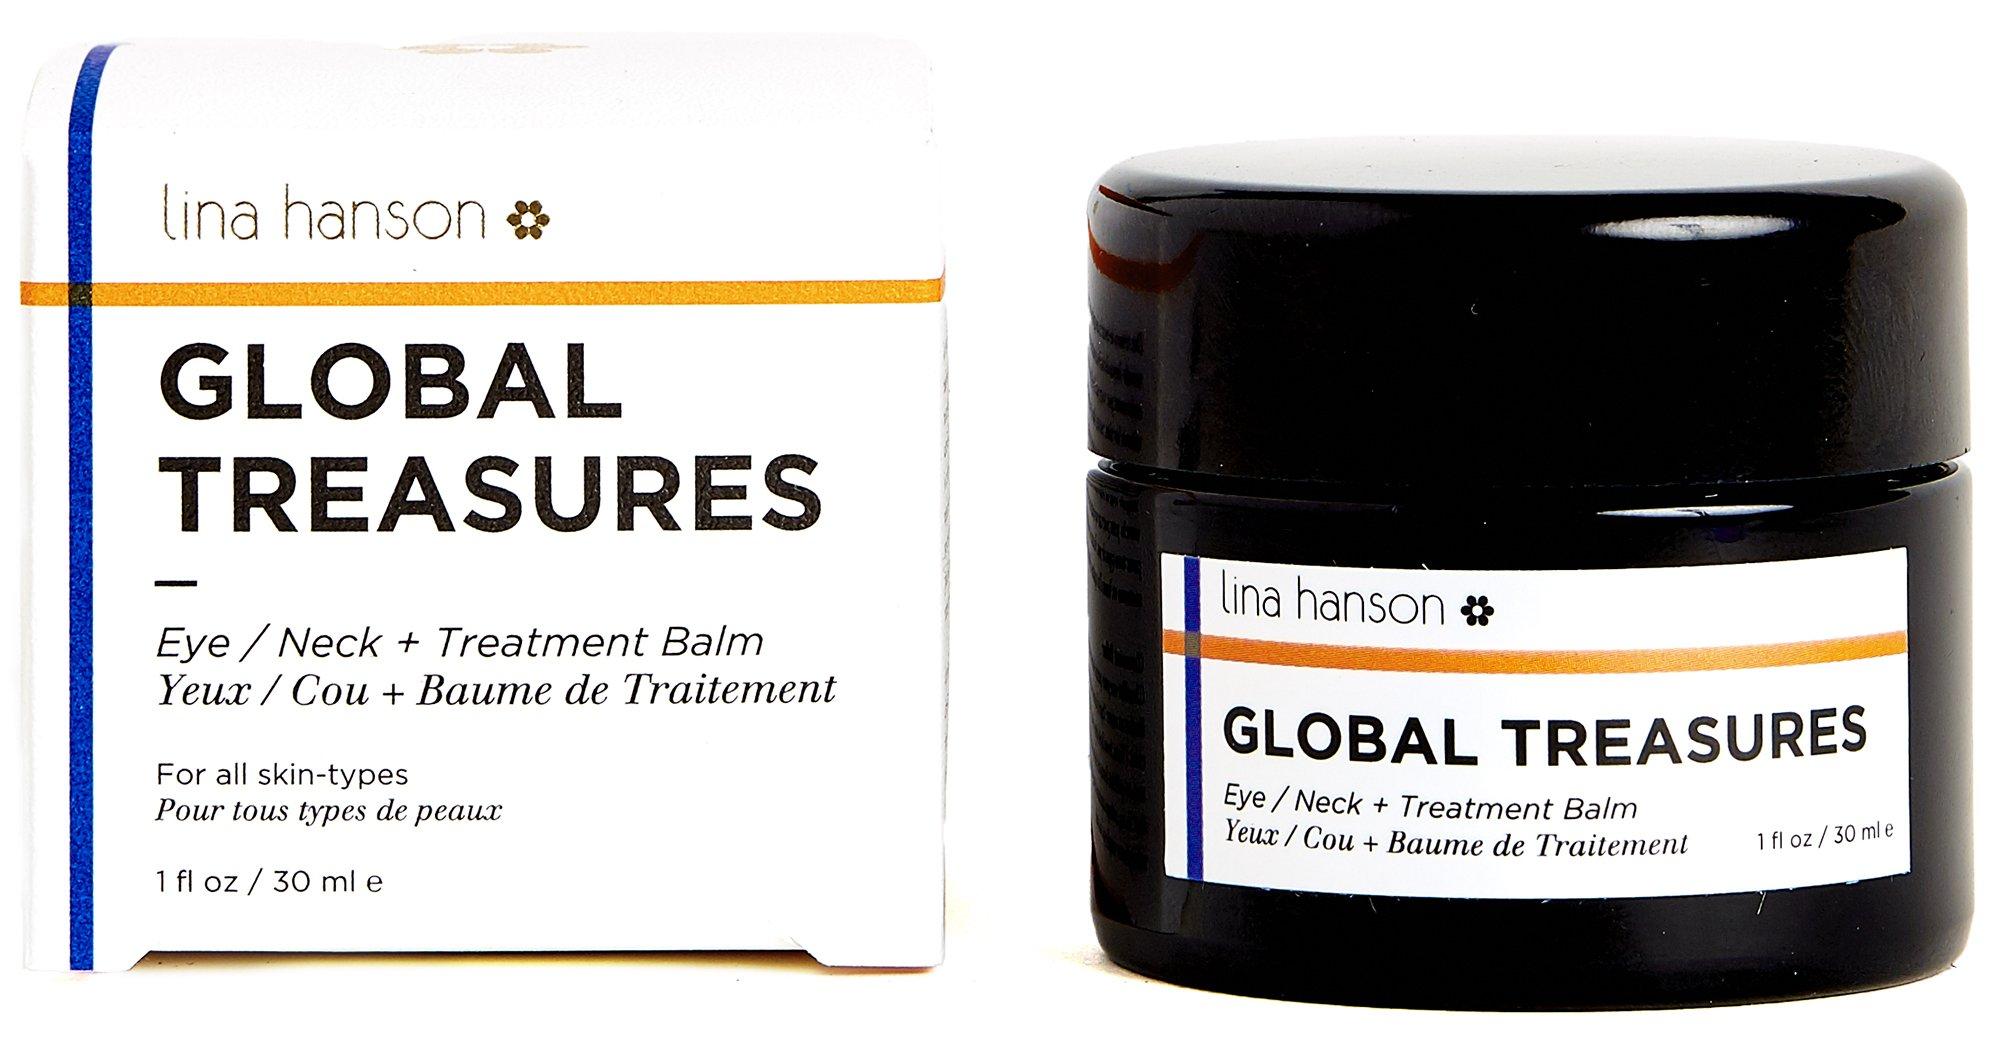 Lina Hanson - Organic Global Treasures (Eye / Neck + Treatment Balm, 1 fl oz / 30 ml)